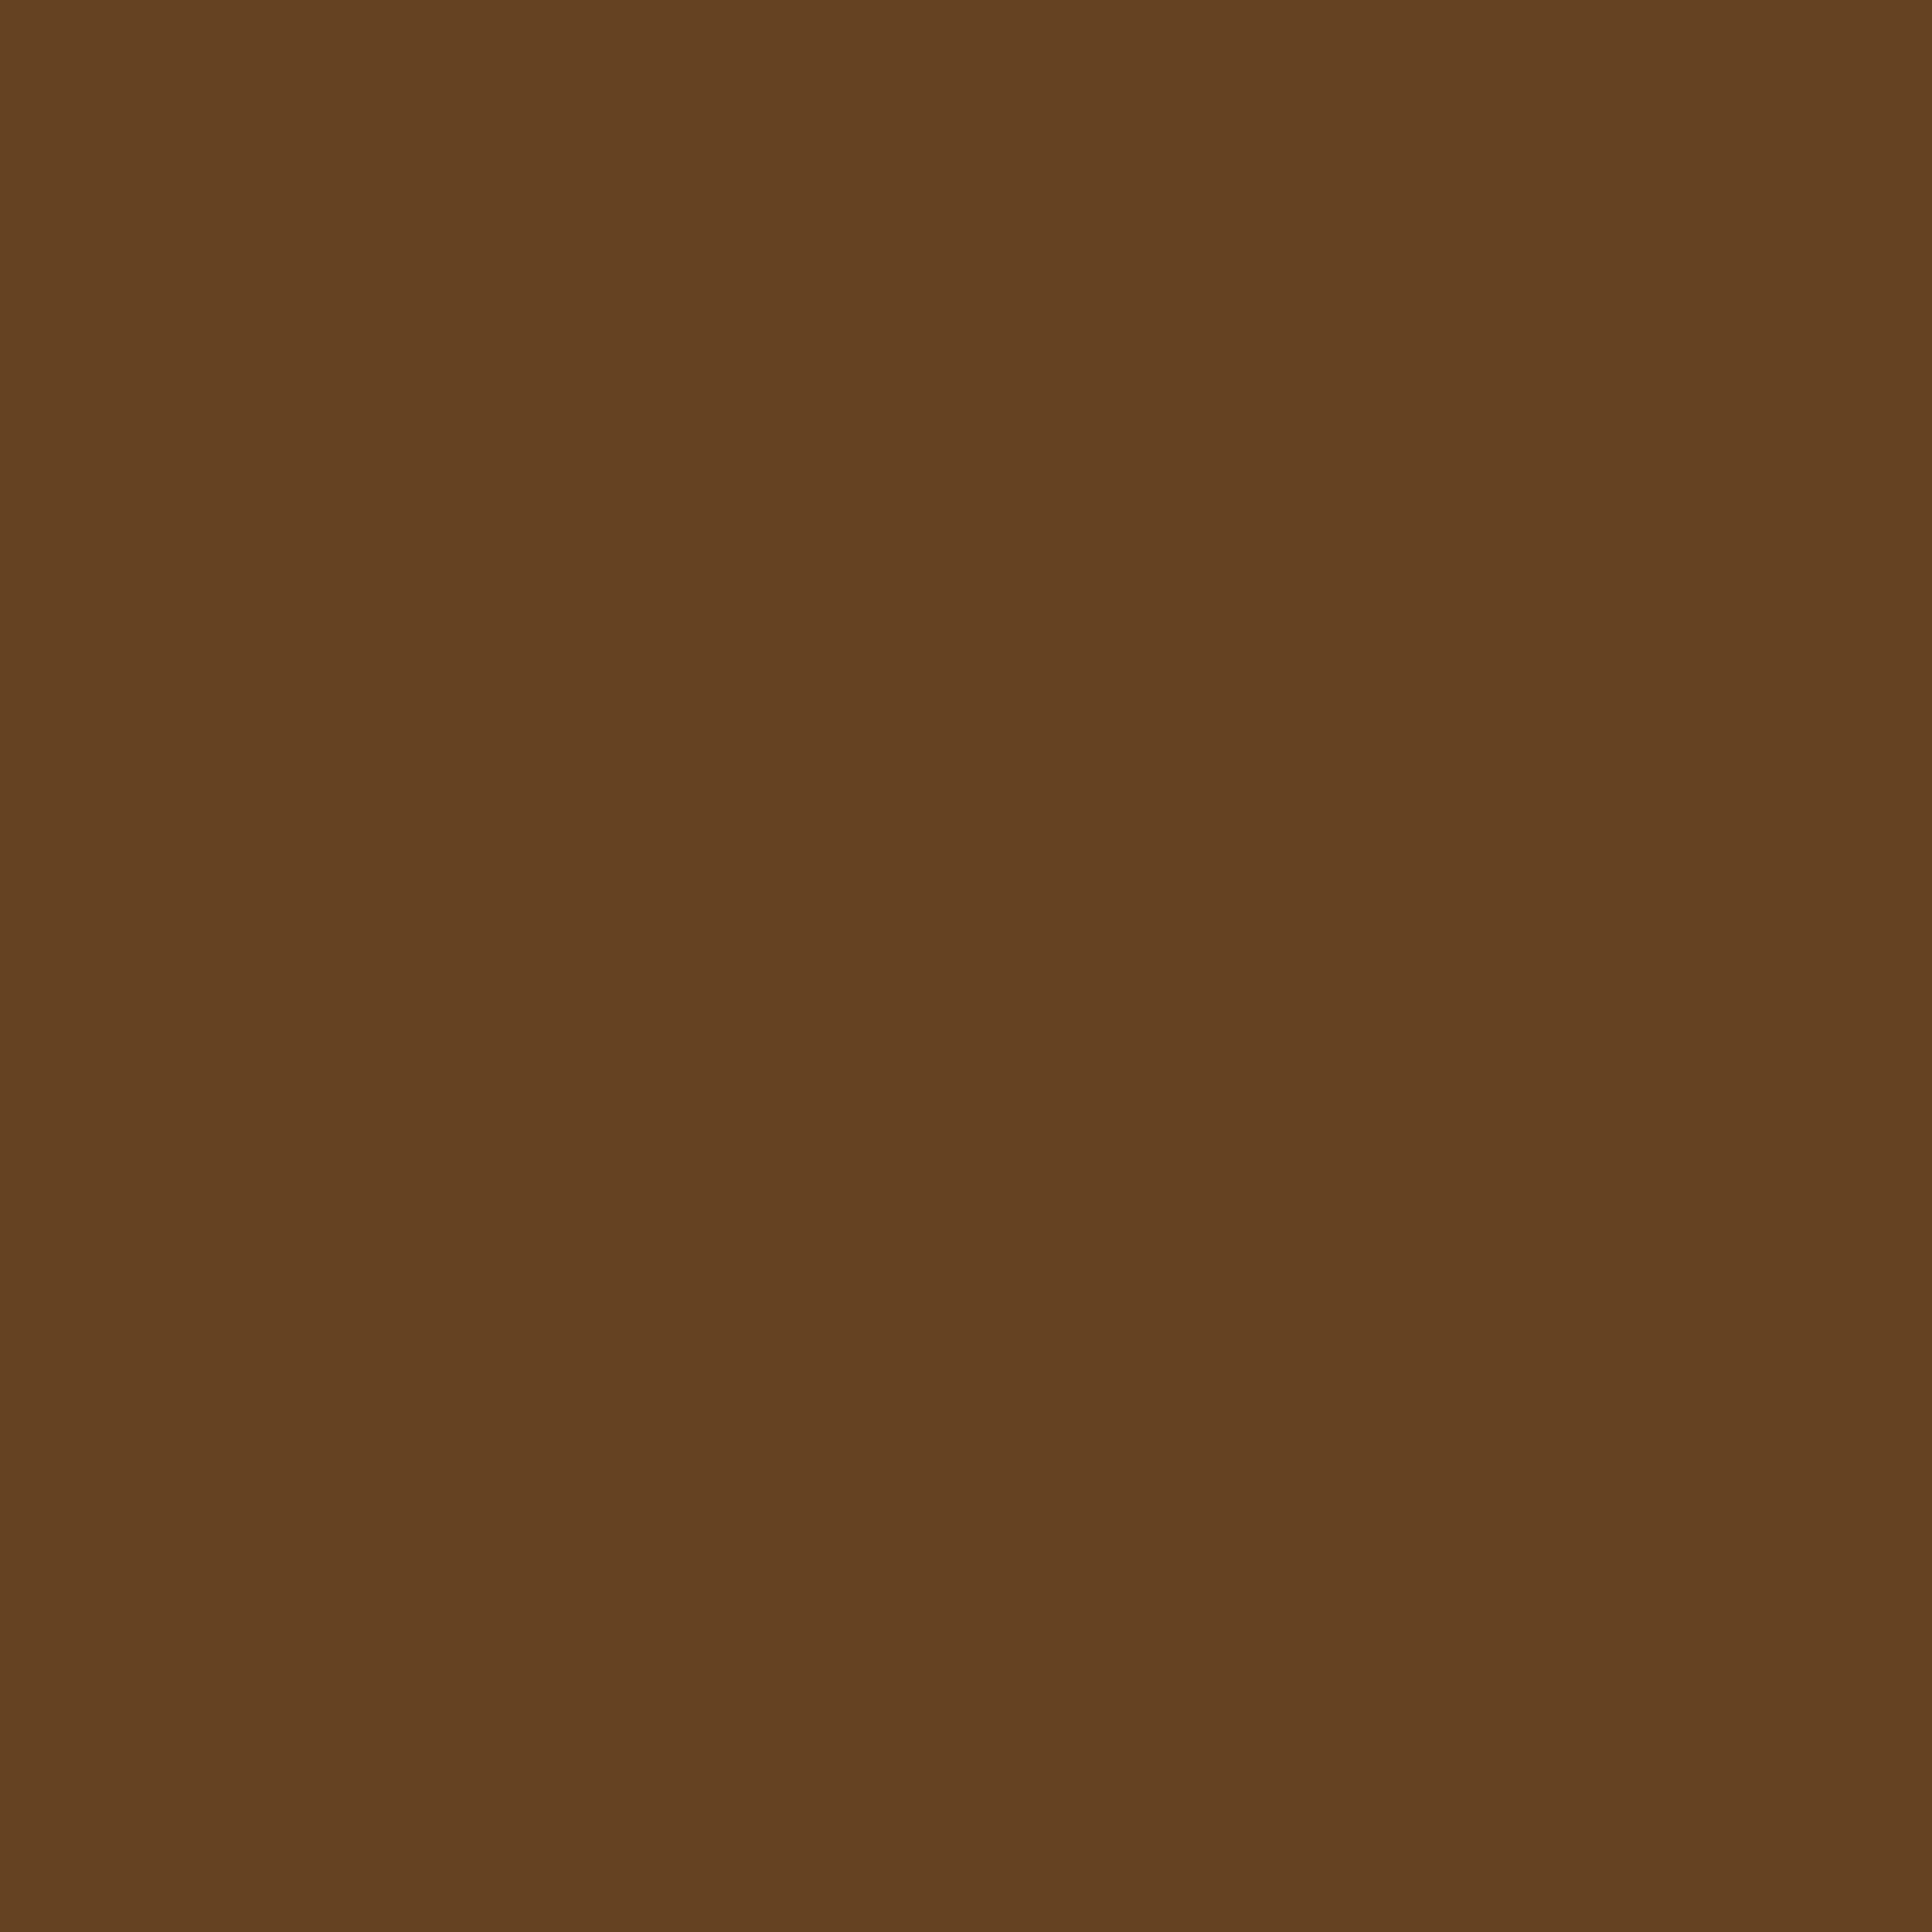 2732x2732 Dark Brown Solid Color Background